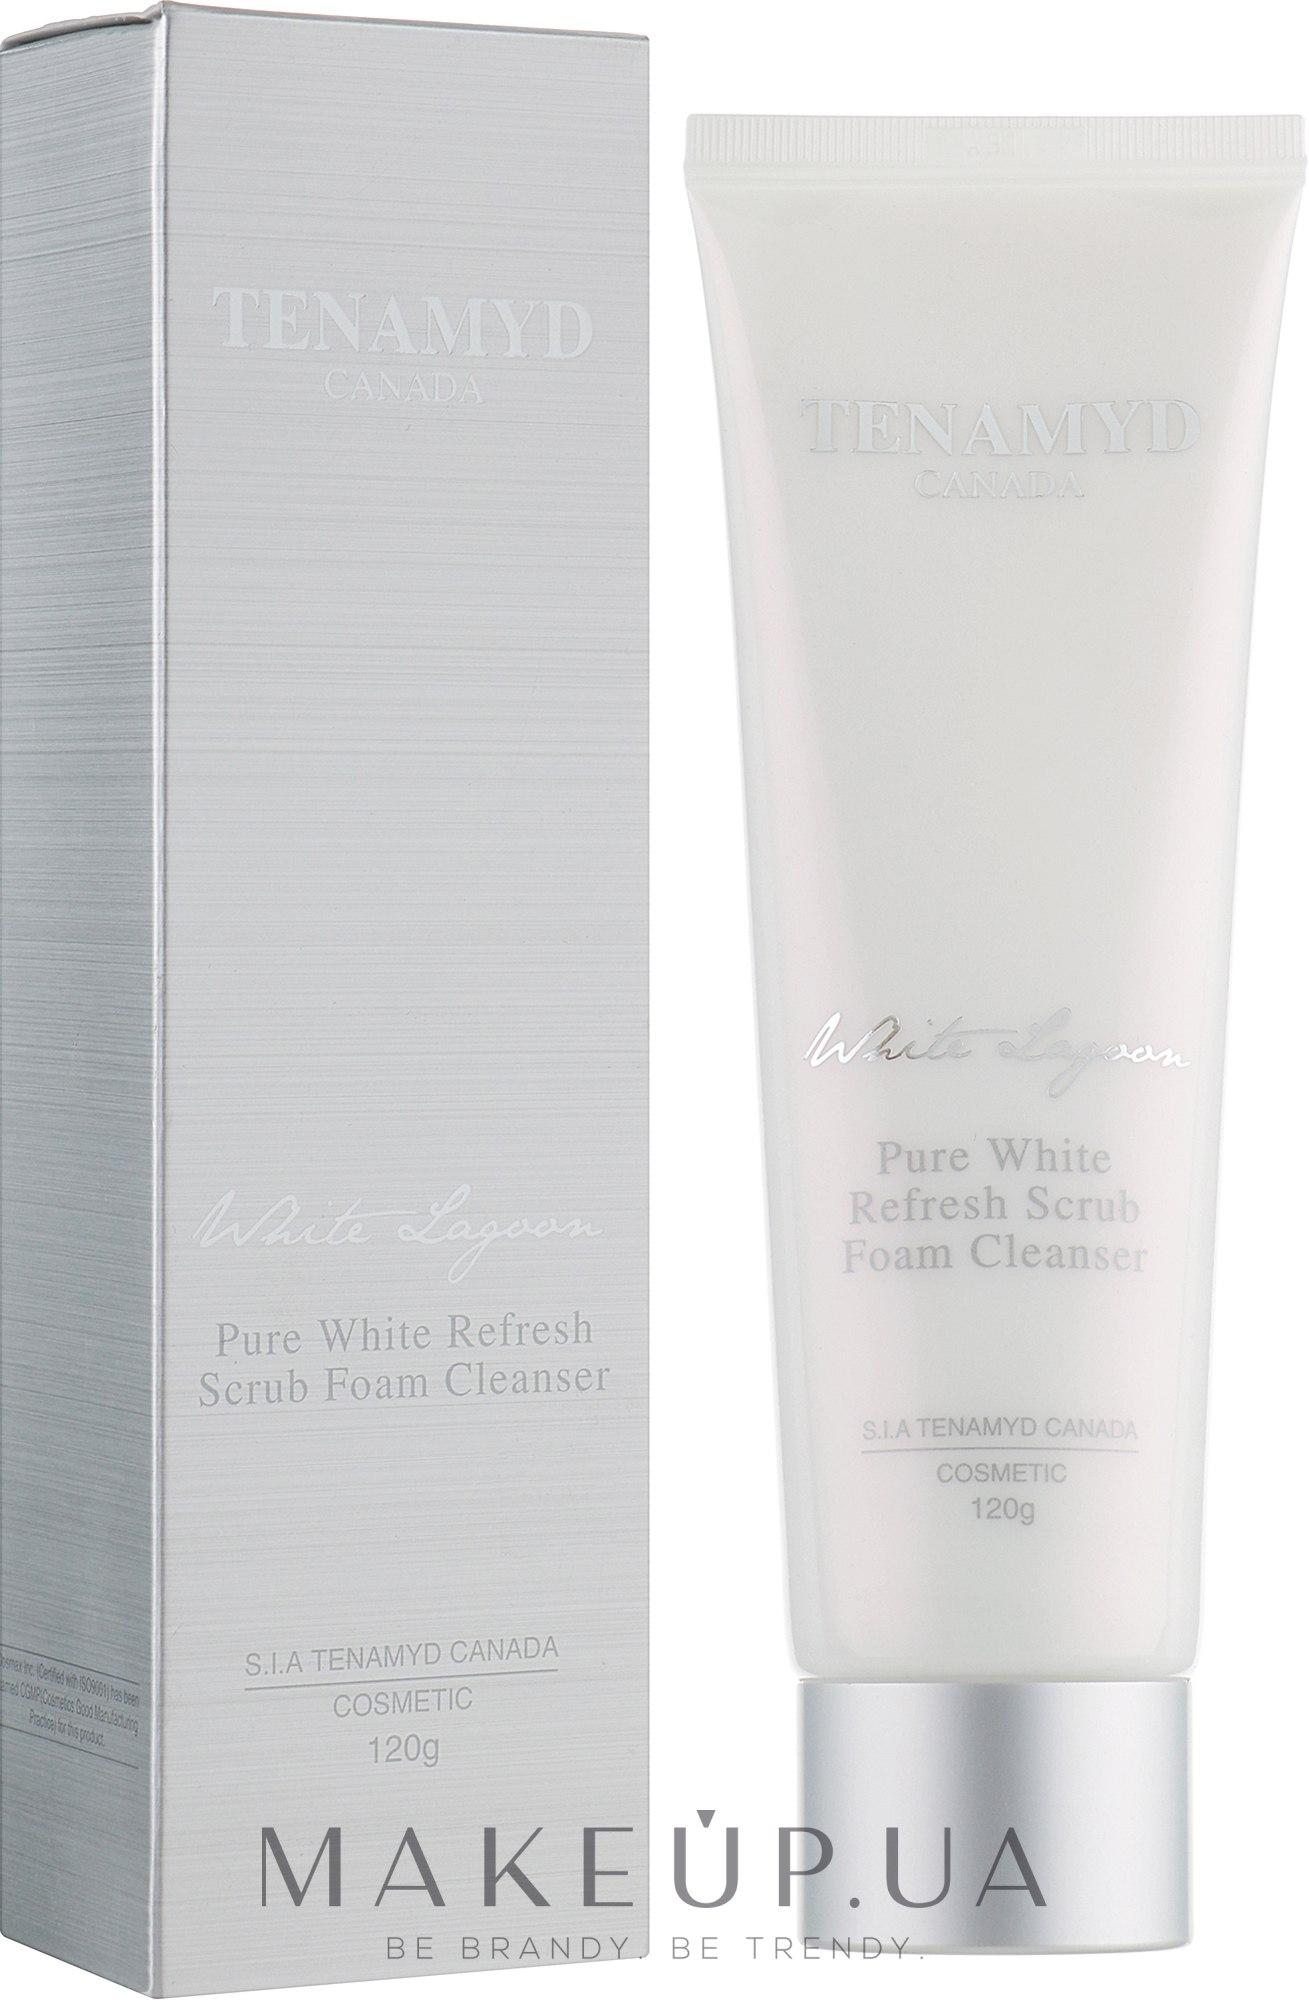 Отбеливающий массажный скраб для кожи с пигментацией - Tenamyd Canada Pure White Refresh Scrub Foam Cleanser — фото 120g